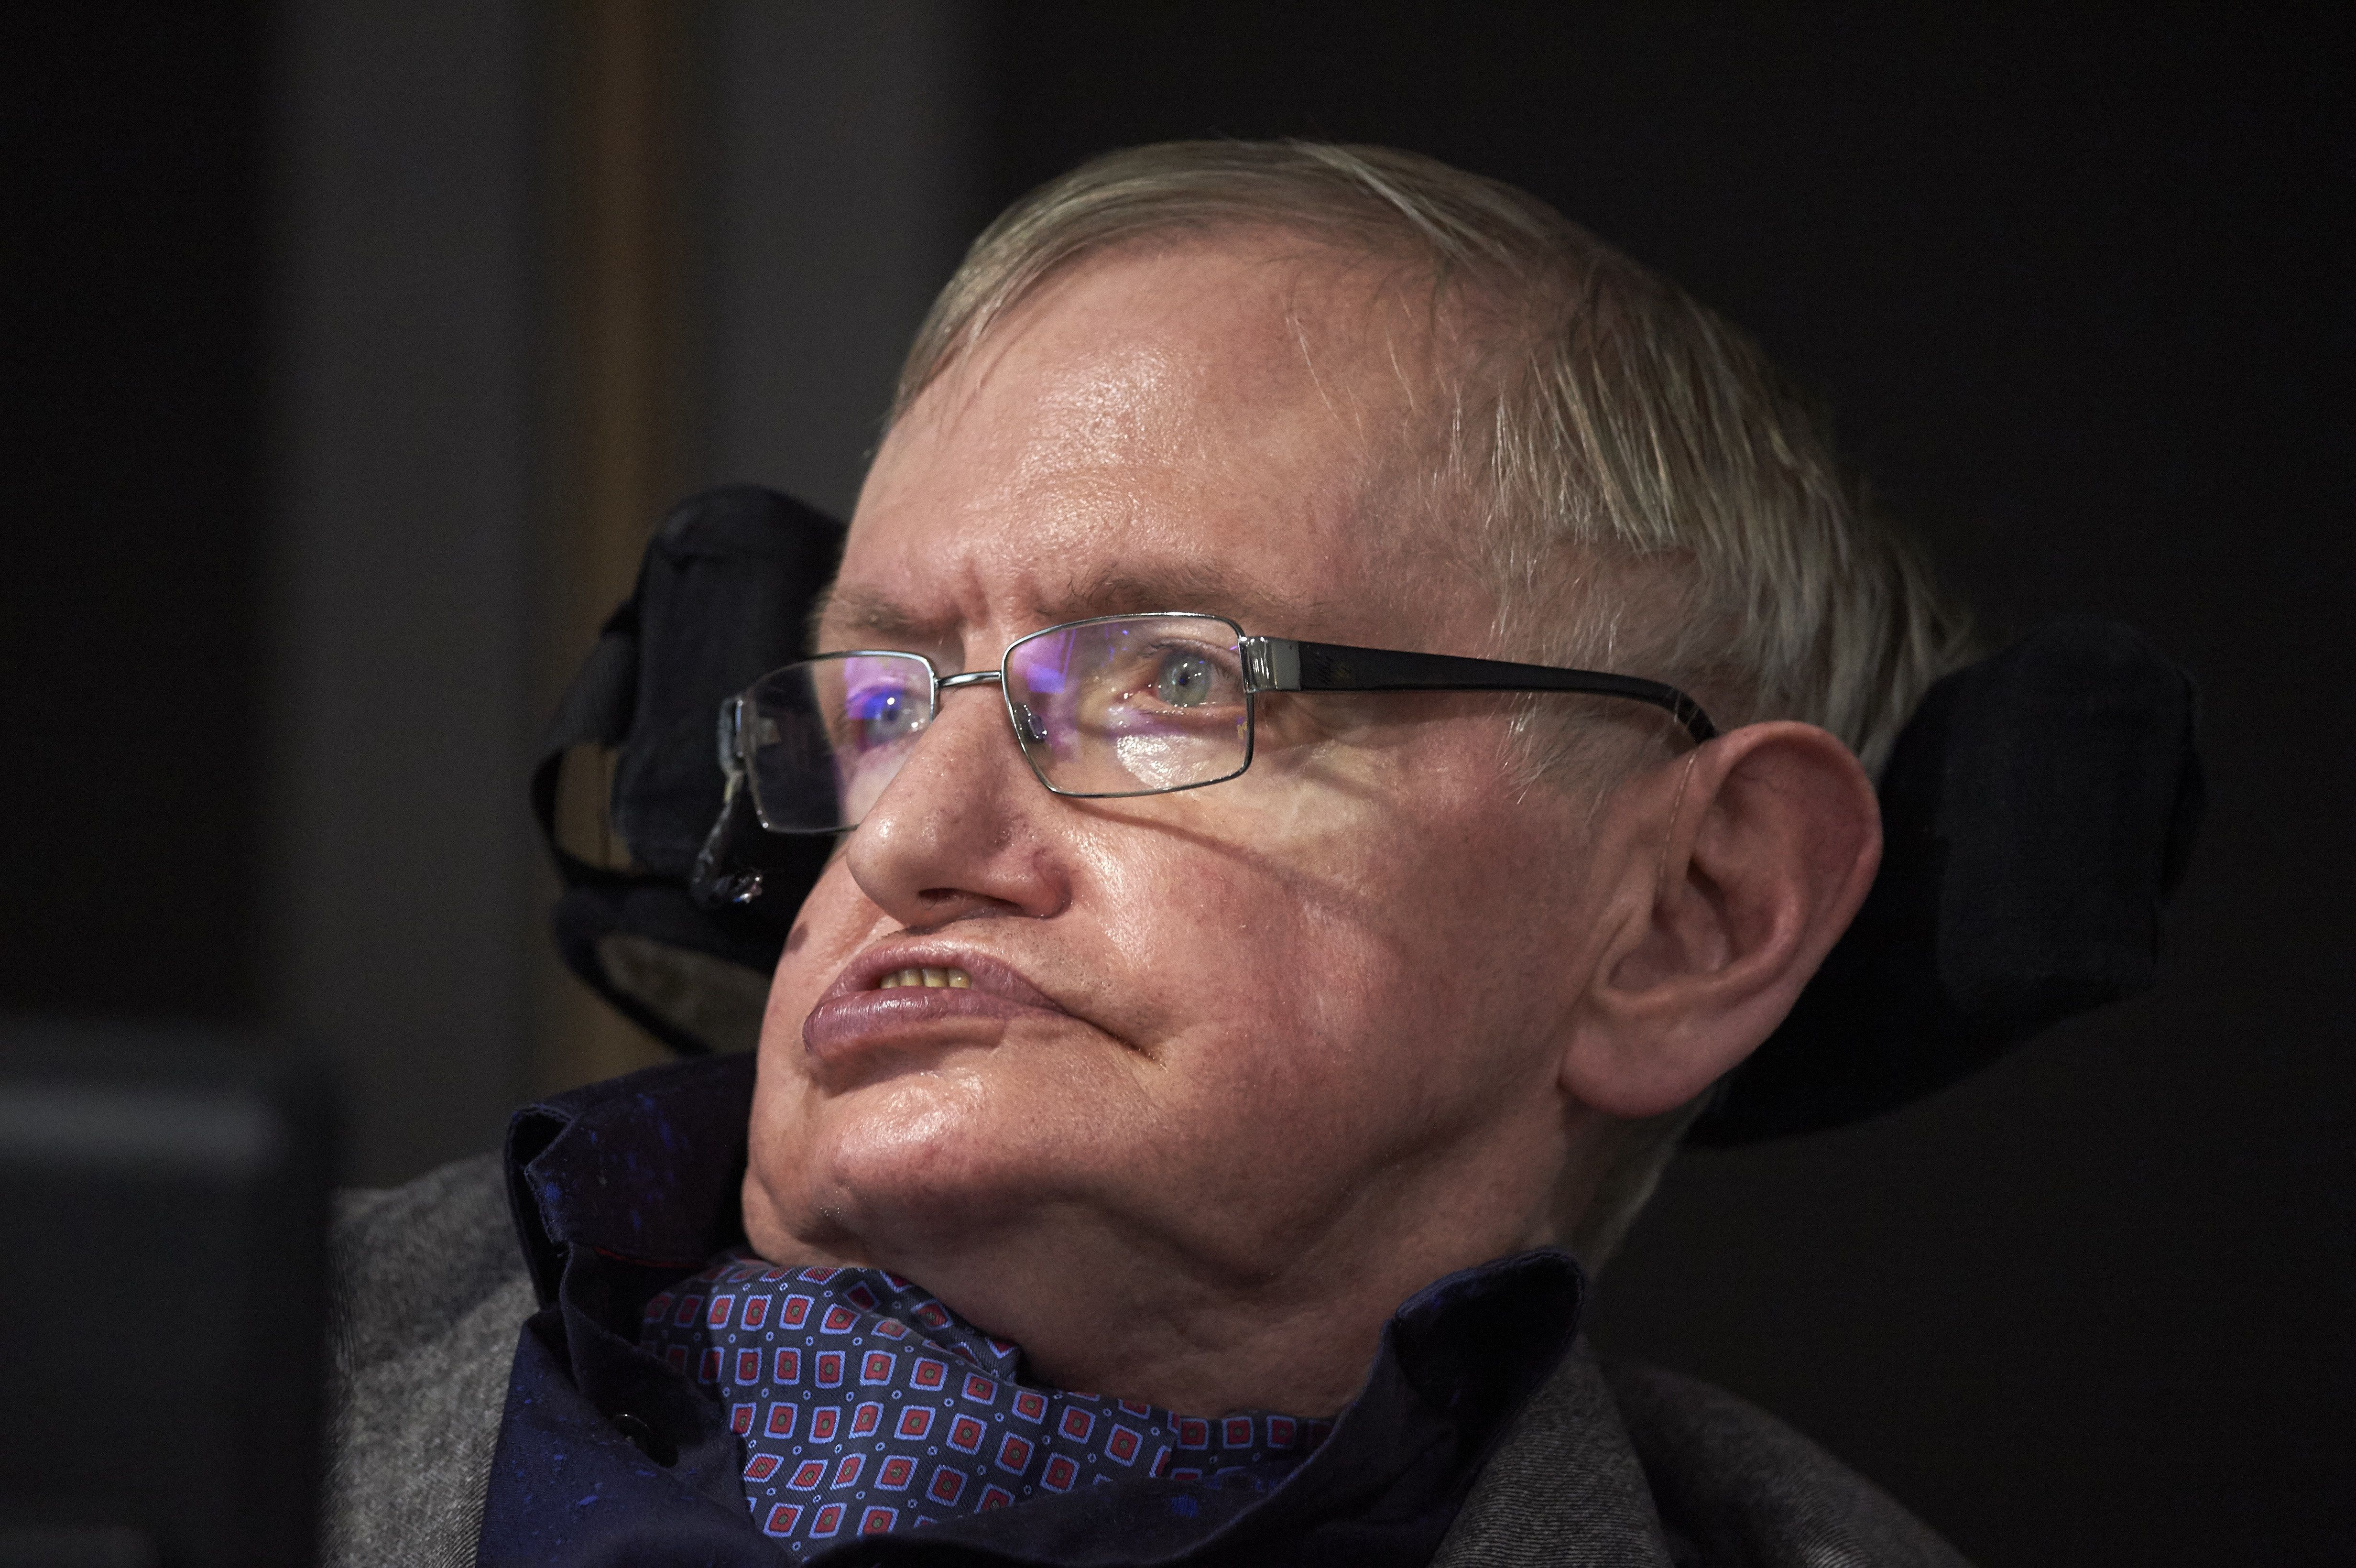 Stephen Hawking's Haunting Last Reddit Posts Are Going Viral